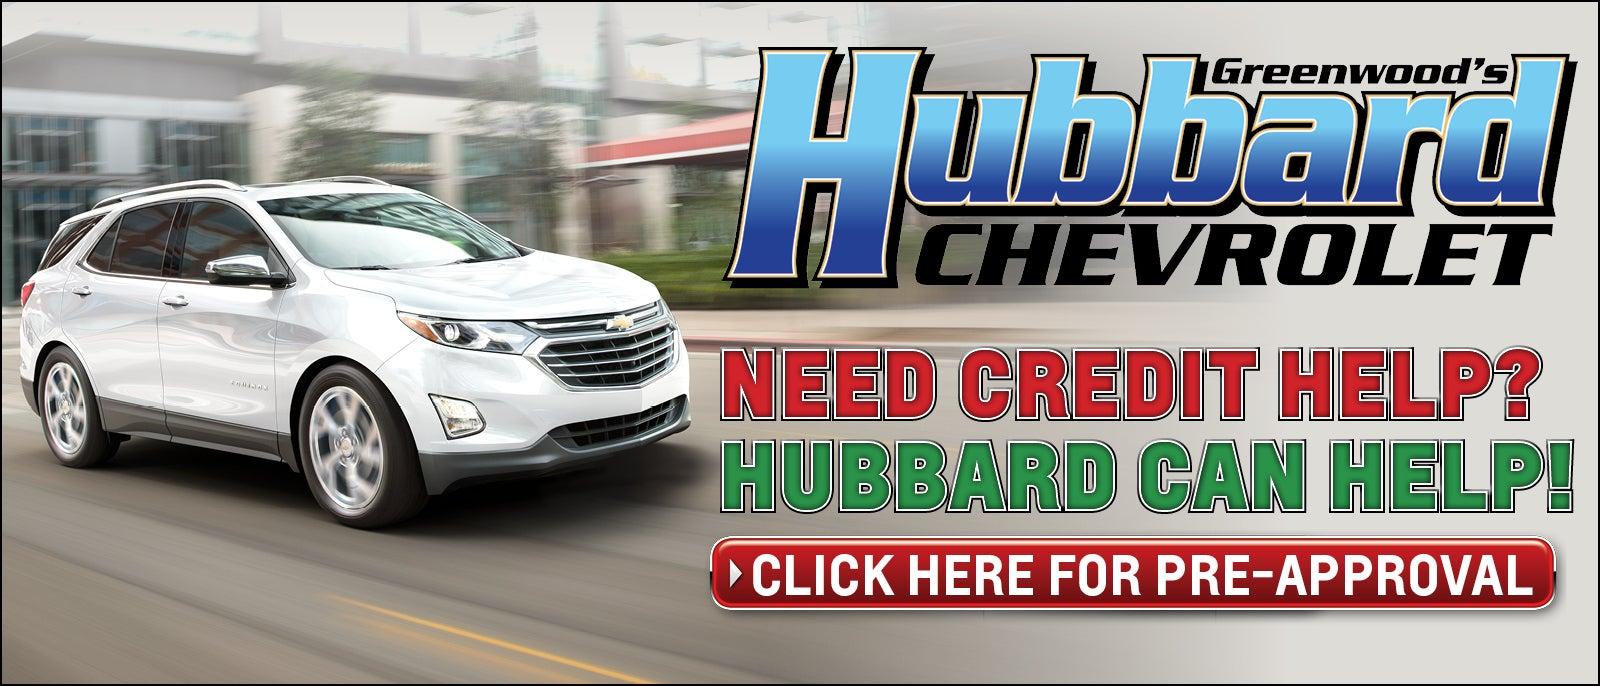 Chevy Dealership Near Warren Ohio Greenwood S Hubbard Chevrolet